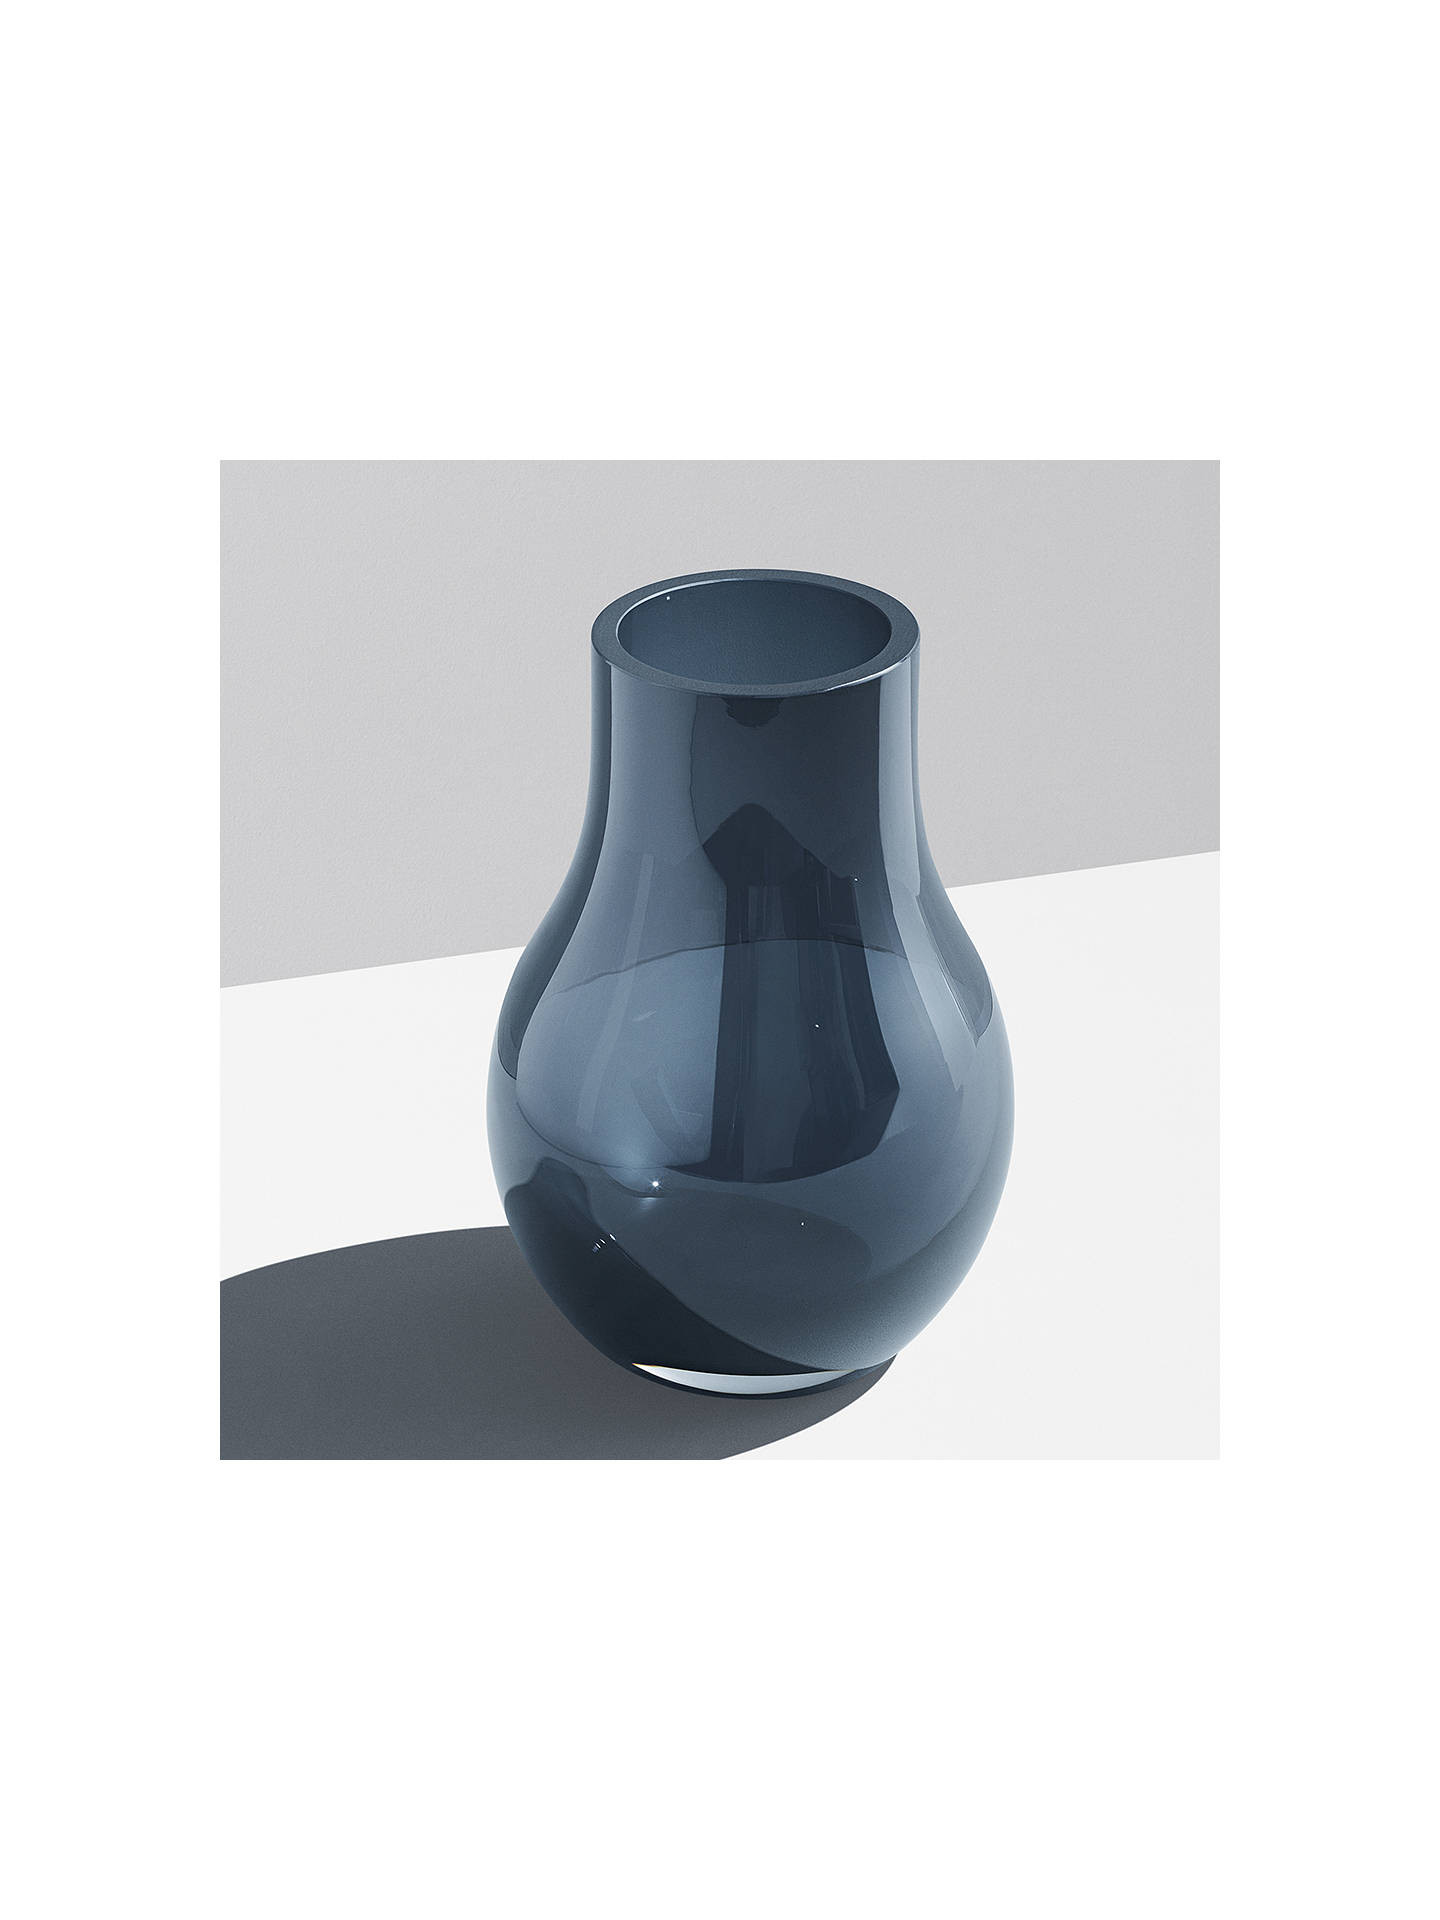 georg jensen green vase of georg jensen cafu vase blue h21 6cm at john lewis partners within buygeorg jensen cafu vase blue h21 6cm online at johnlewis com